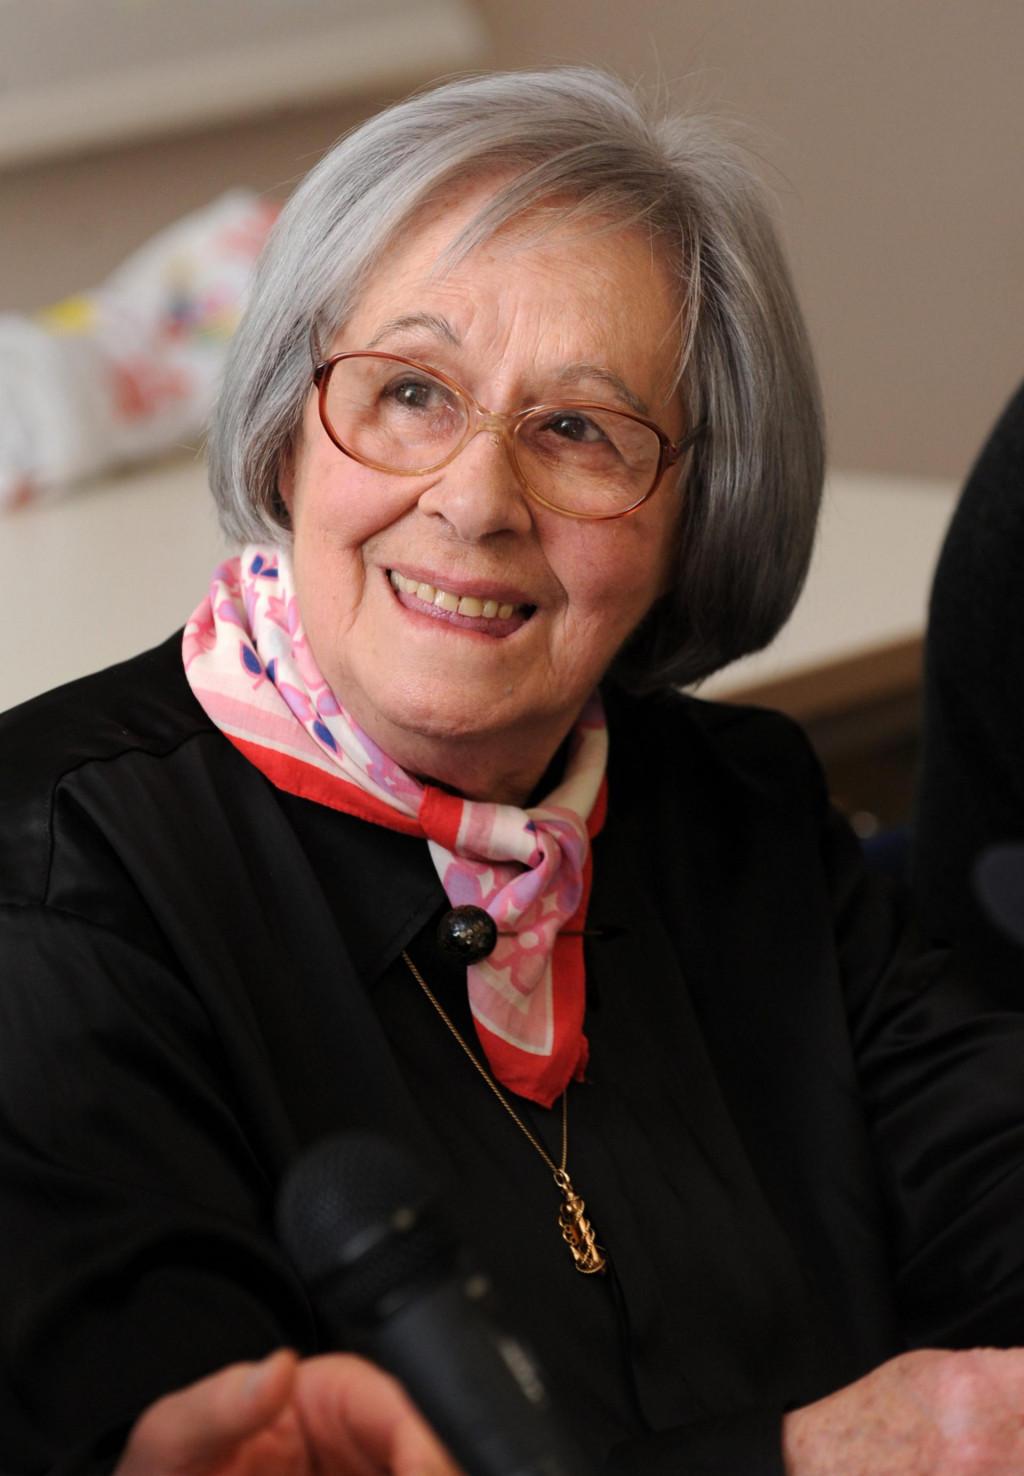 Magda Matošić od 1950.-ih je na splitskoj sceni<br /> <br /> <br /> <br /> <br /> <br /> <br /> <br /> <br /> <br /> <br /> <br /> <br /> <br /> <br /> <br /> <br /> <br /> <br /> <br /> <br /> <br /> <br /> <br /> <br /> <br />